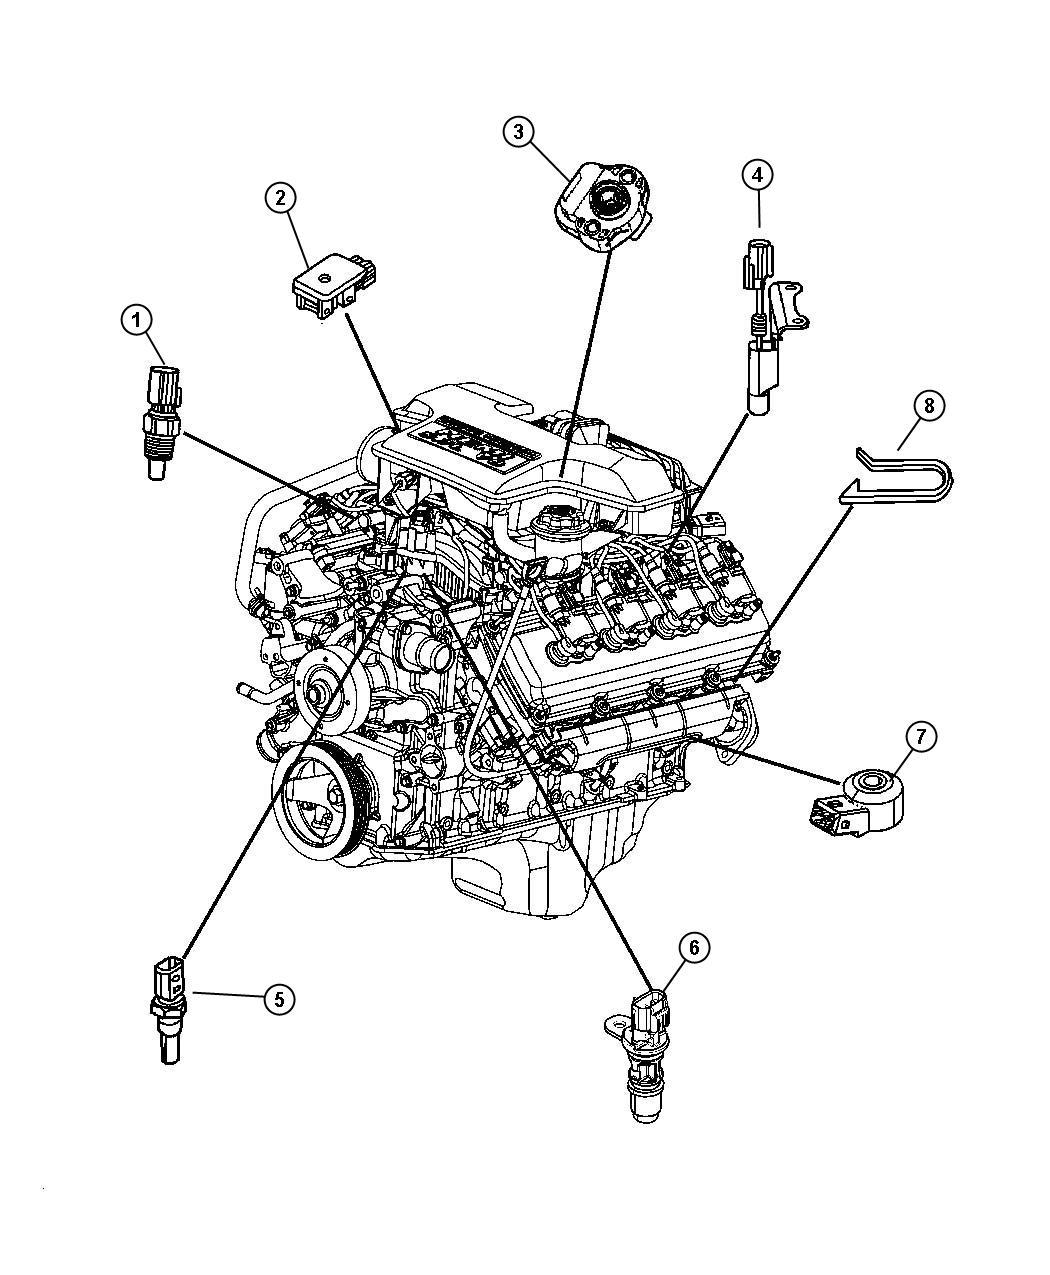 Dodge Ram 1500 Sensor. Map. After 01/06/06, up to 01/11/06